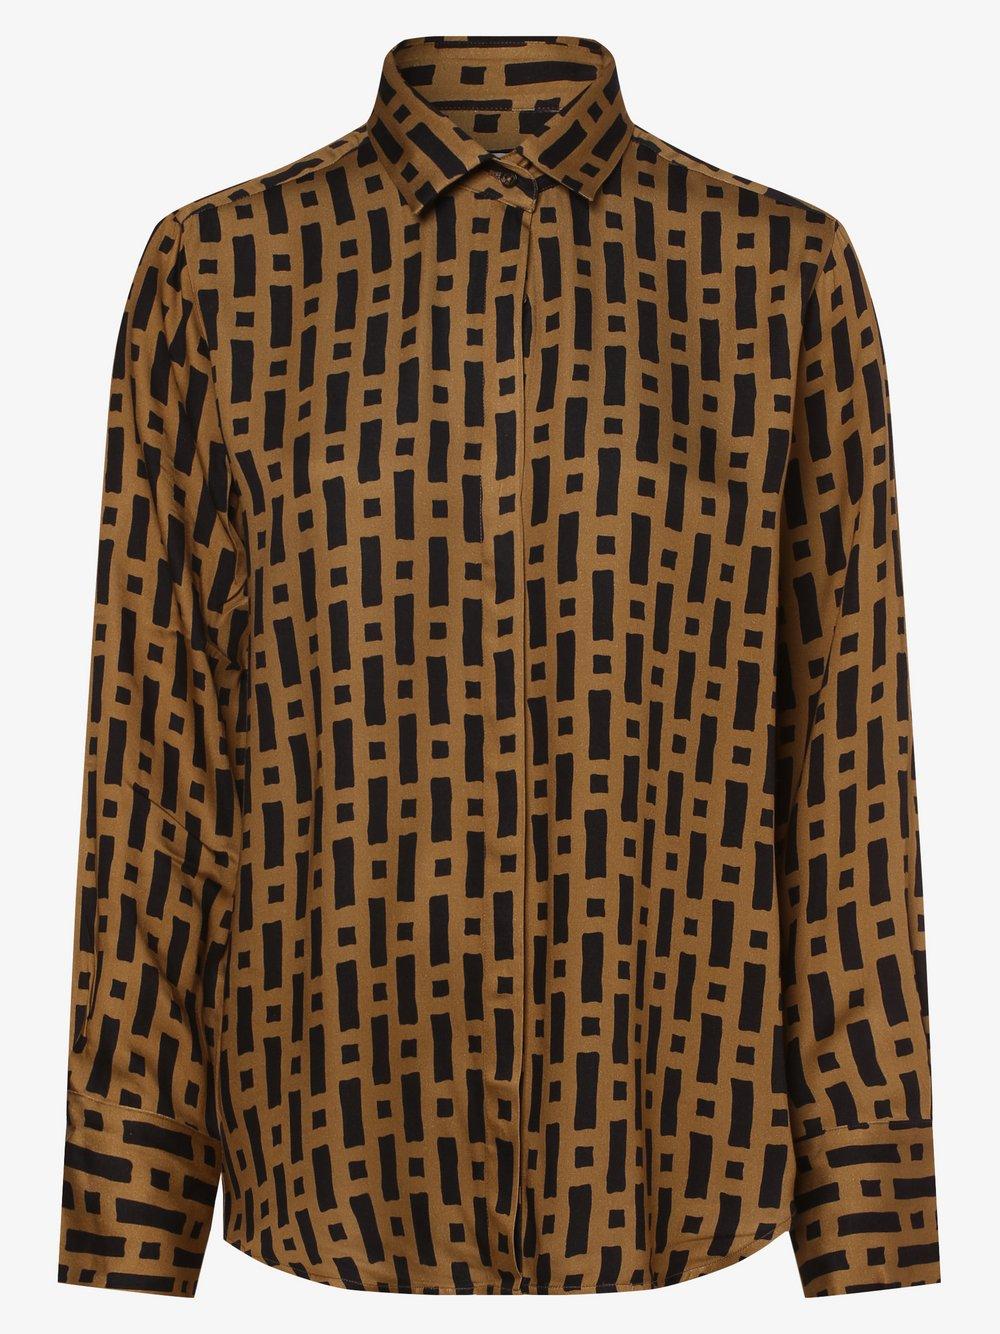 0039 Italy – Bluzka damska – Odetta, beżowy Van Graaf 486058-0001-09920